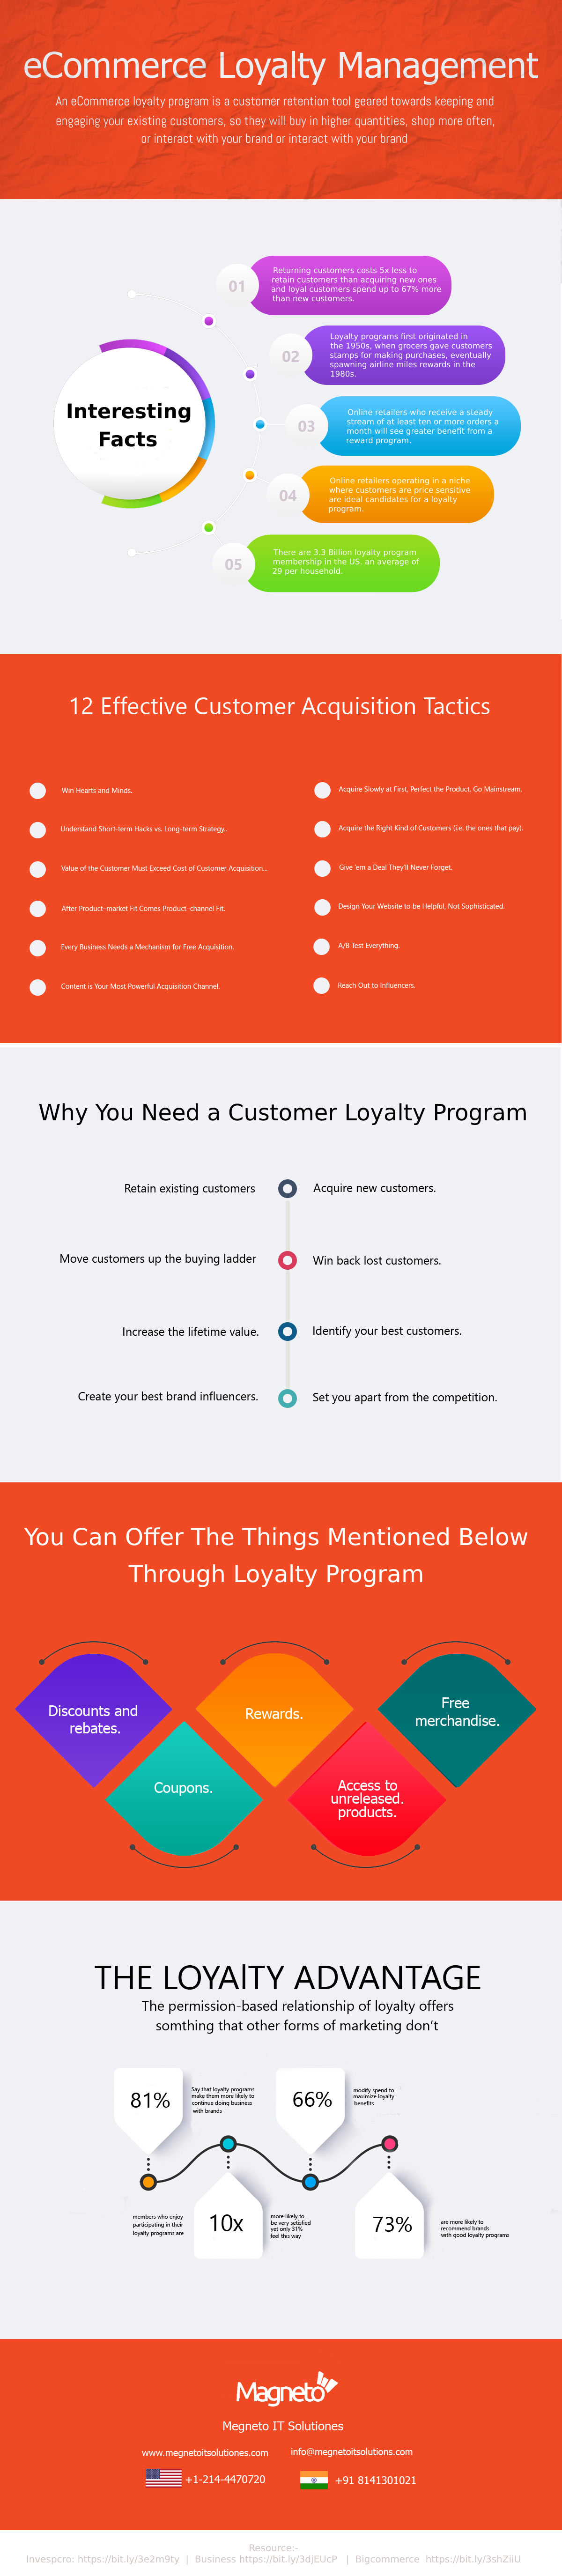 eCommerce-Loyalty-program-infographic